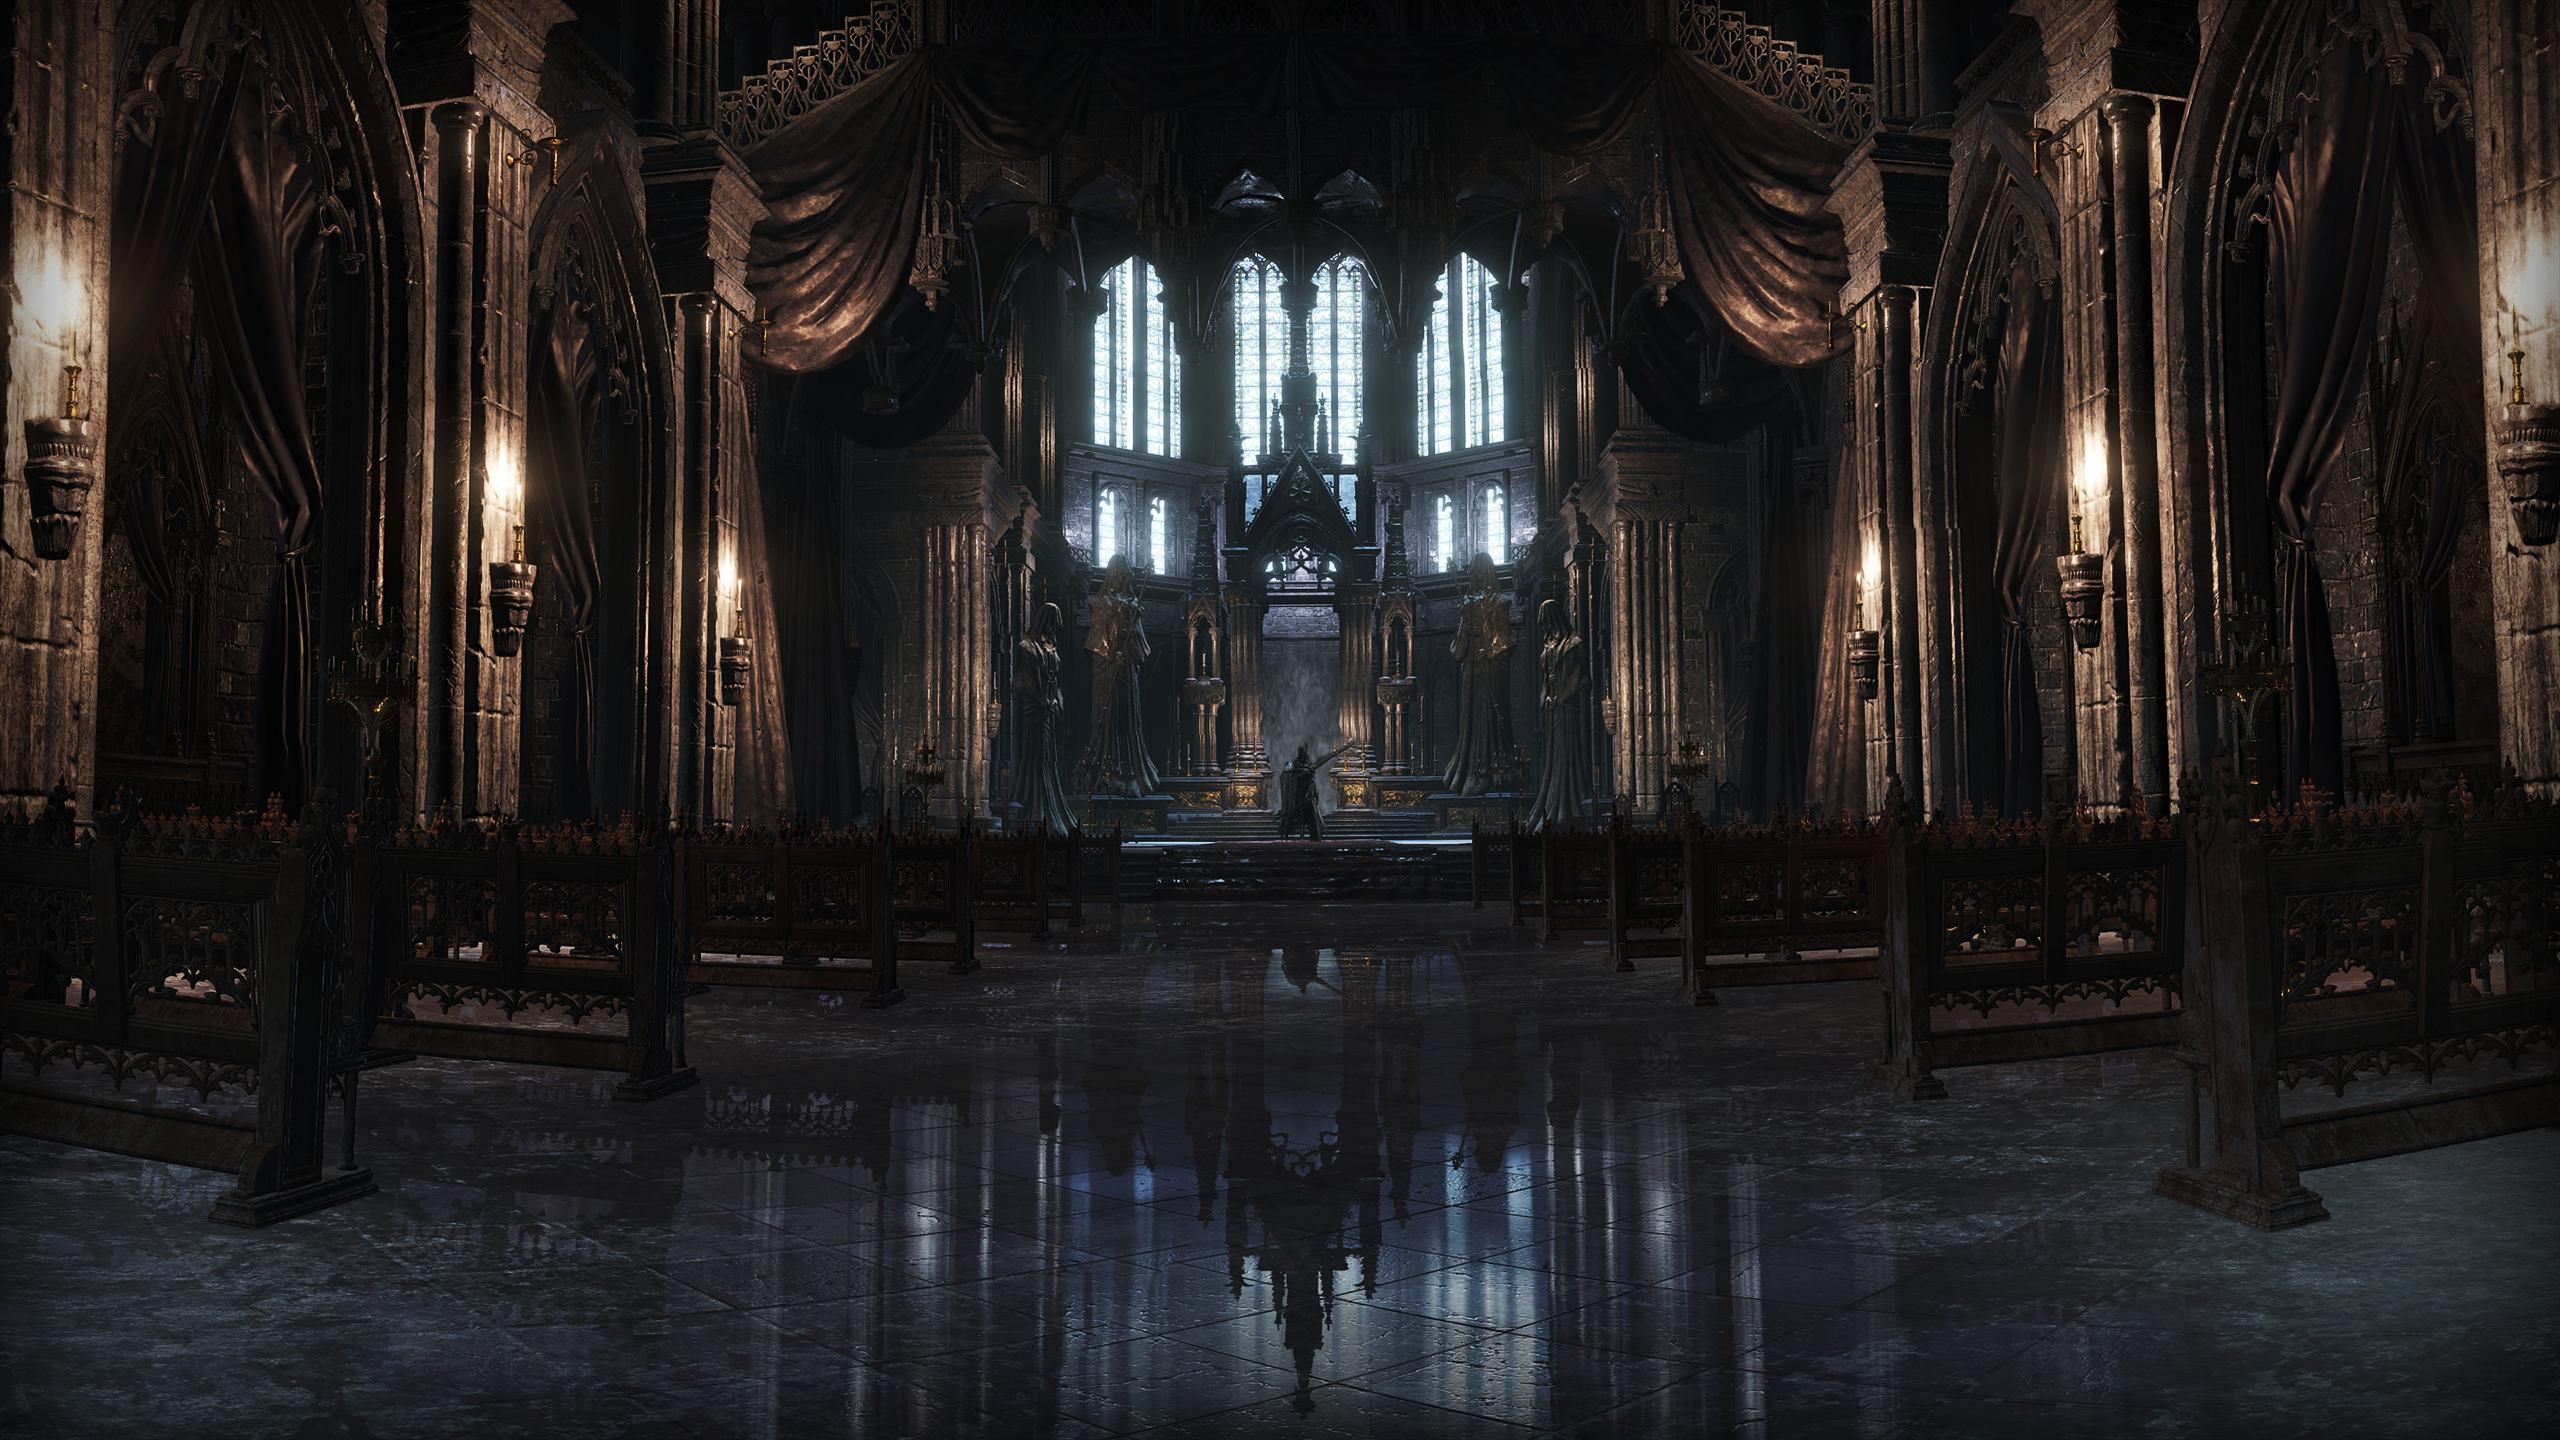 Dark Souls Iii Hd Wallpaper Background Image 2560x1440 Id 717288 Wallpaper Abyss